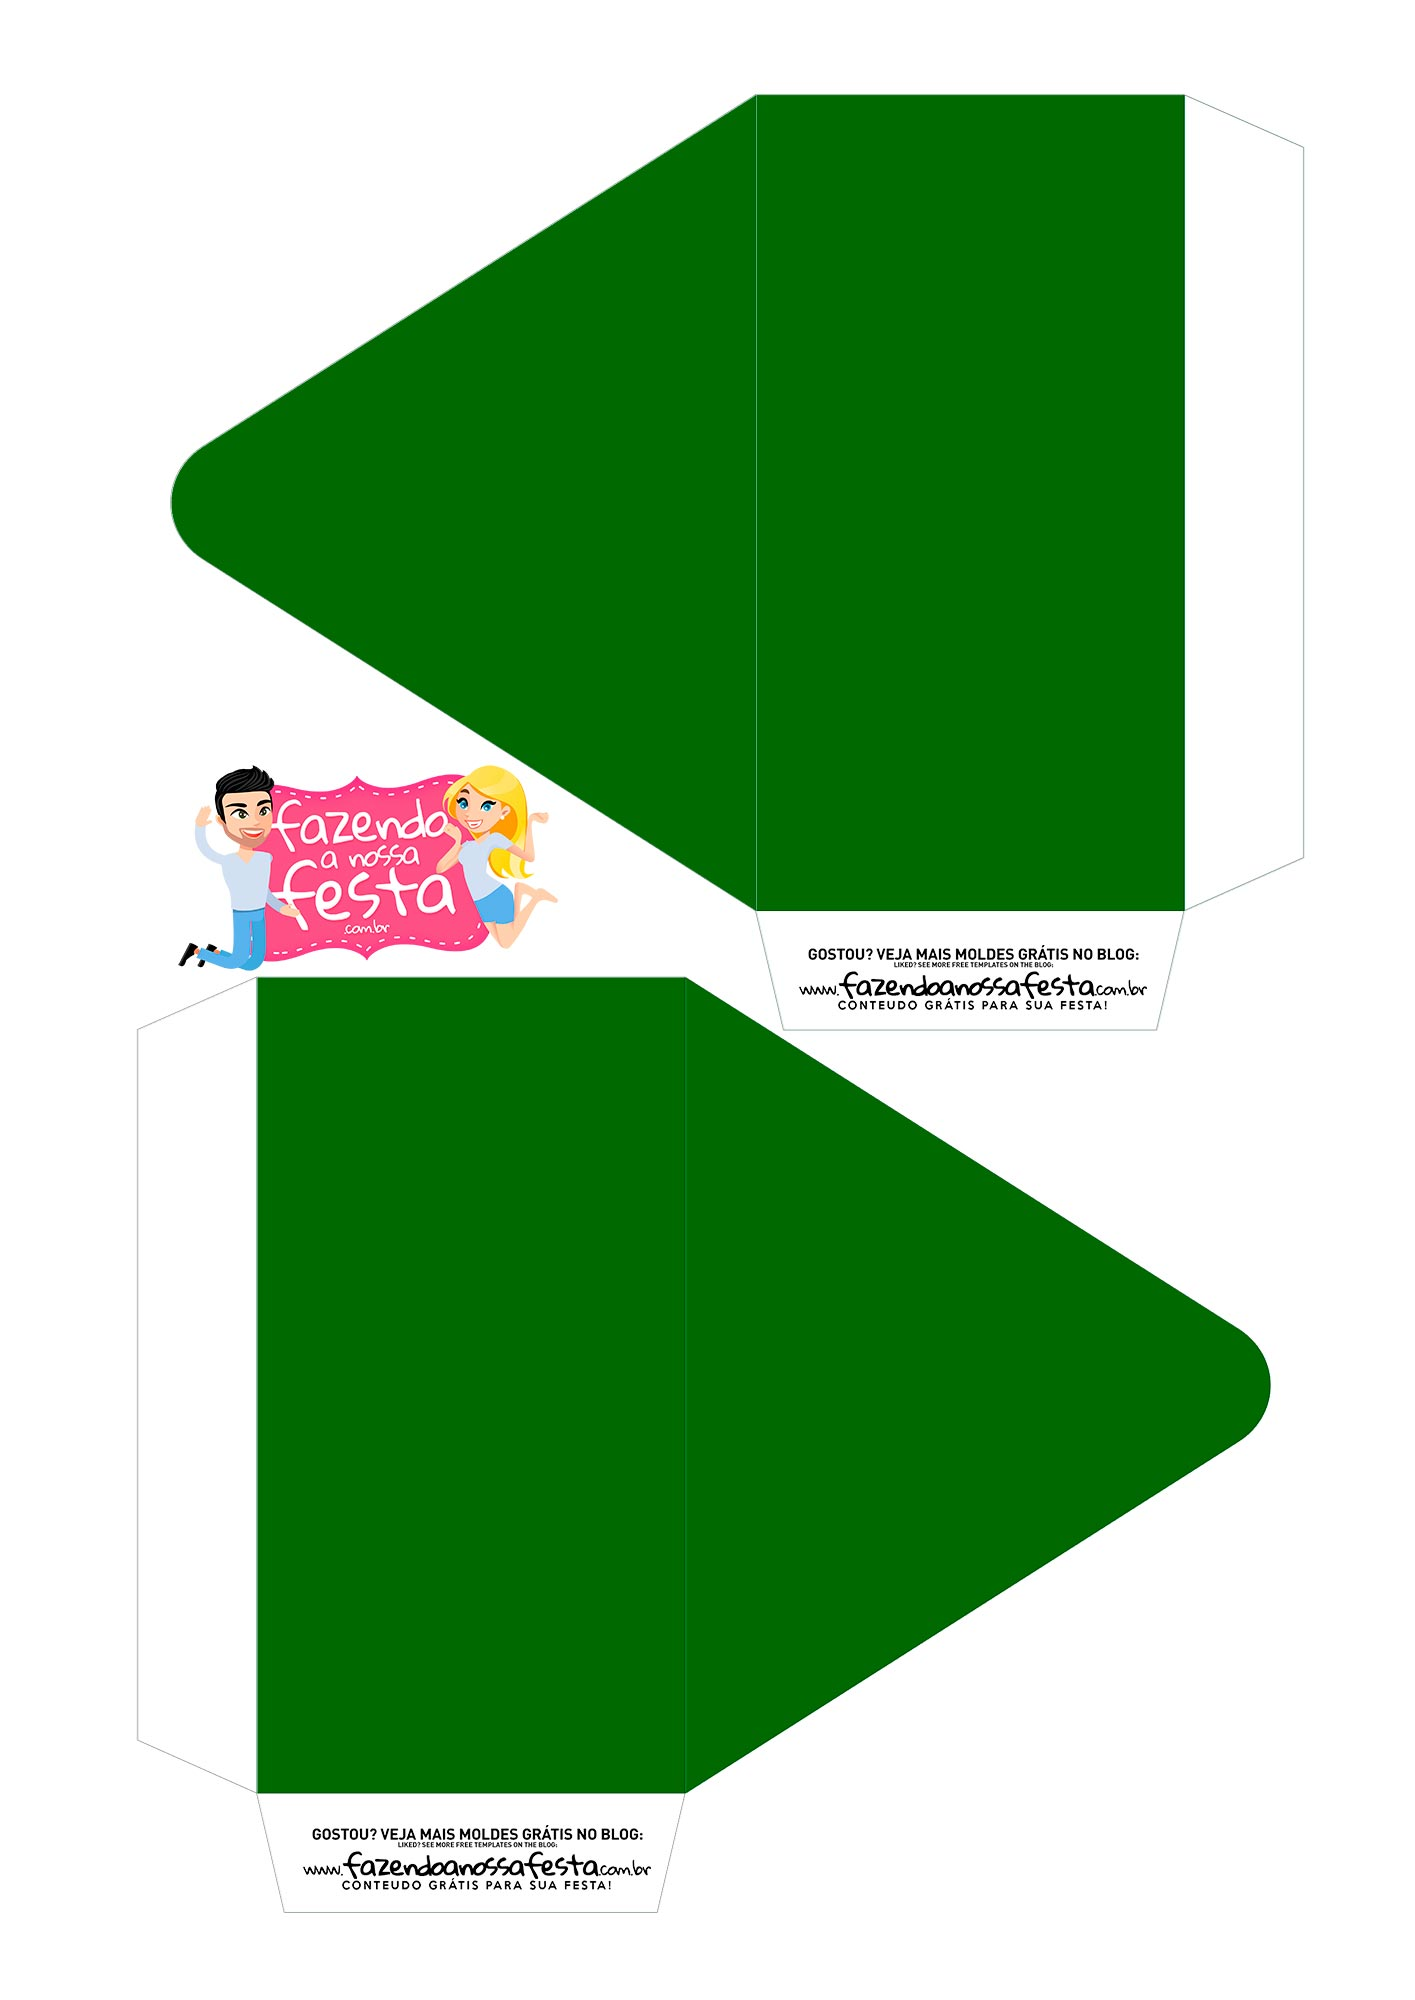 Caixa Envelope Heineken 1